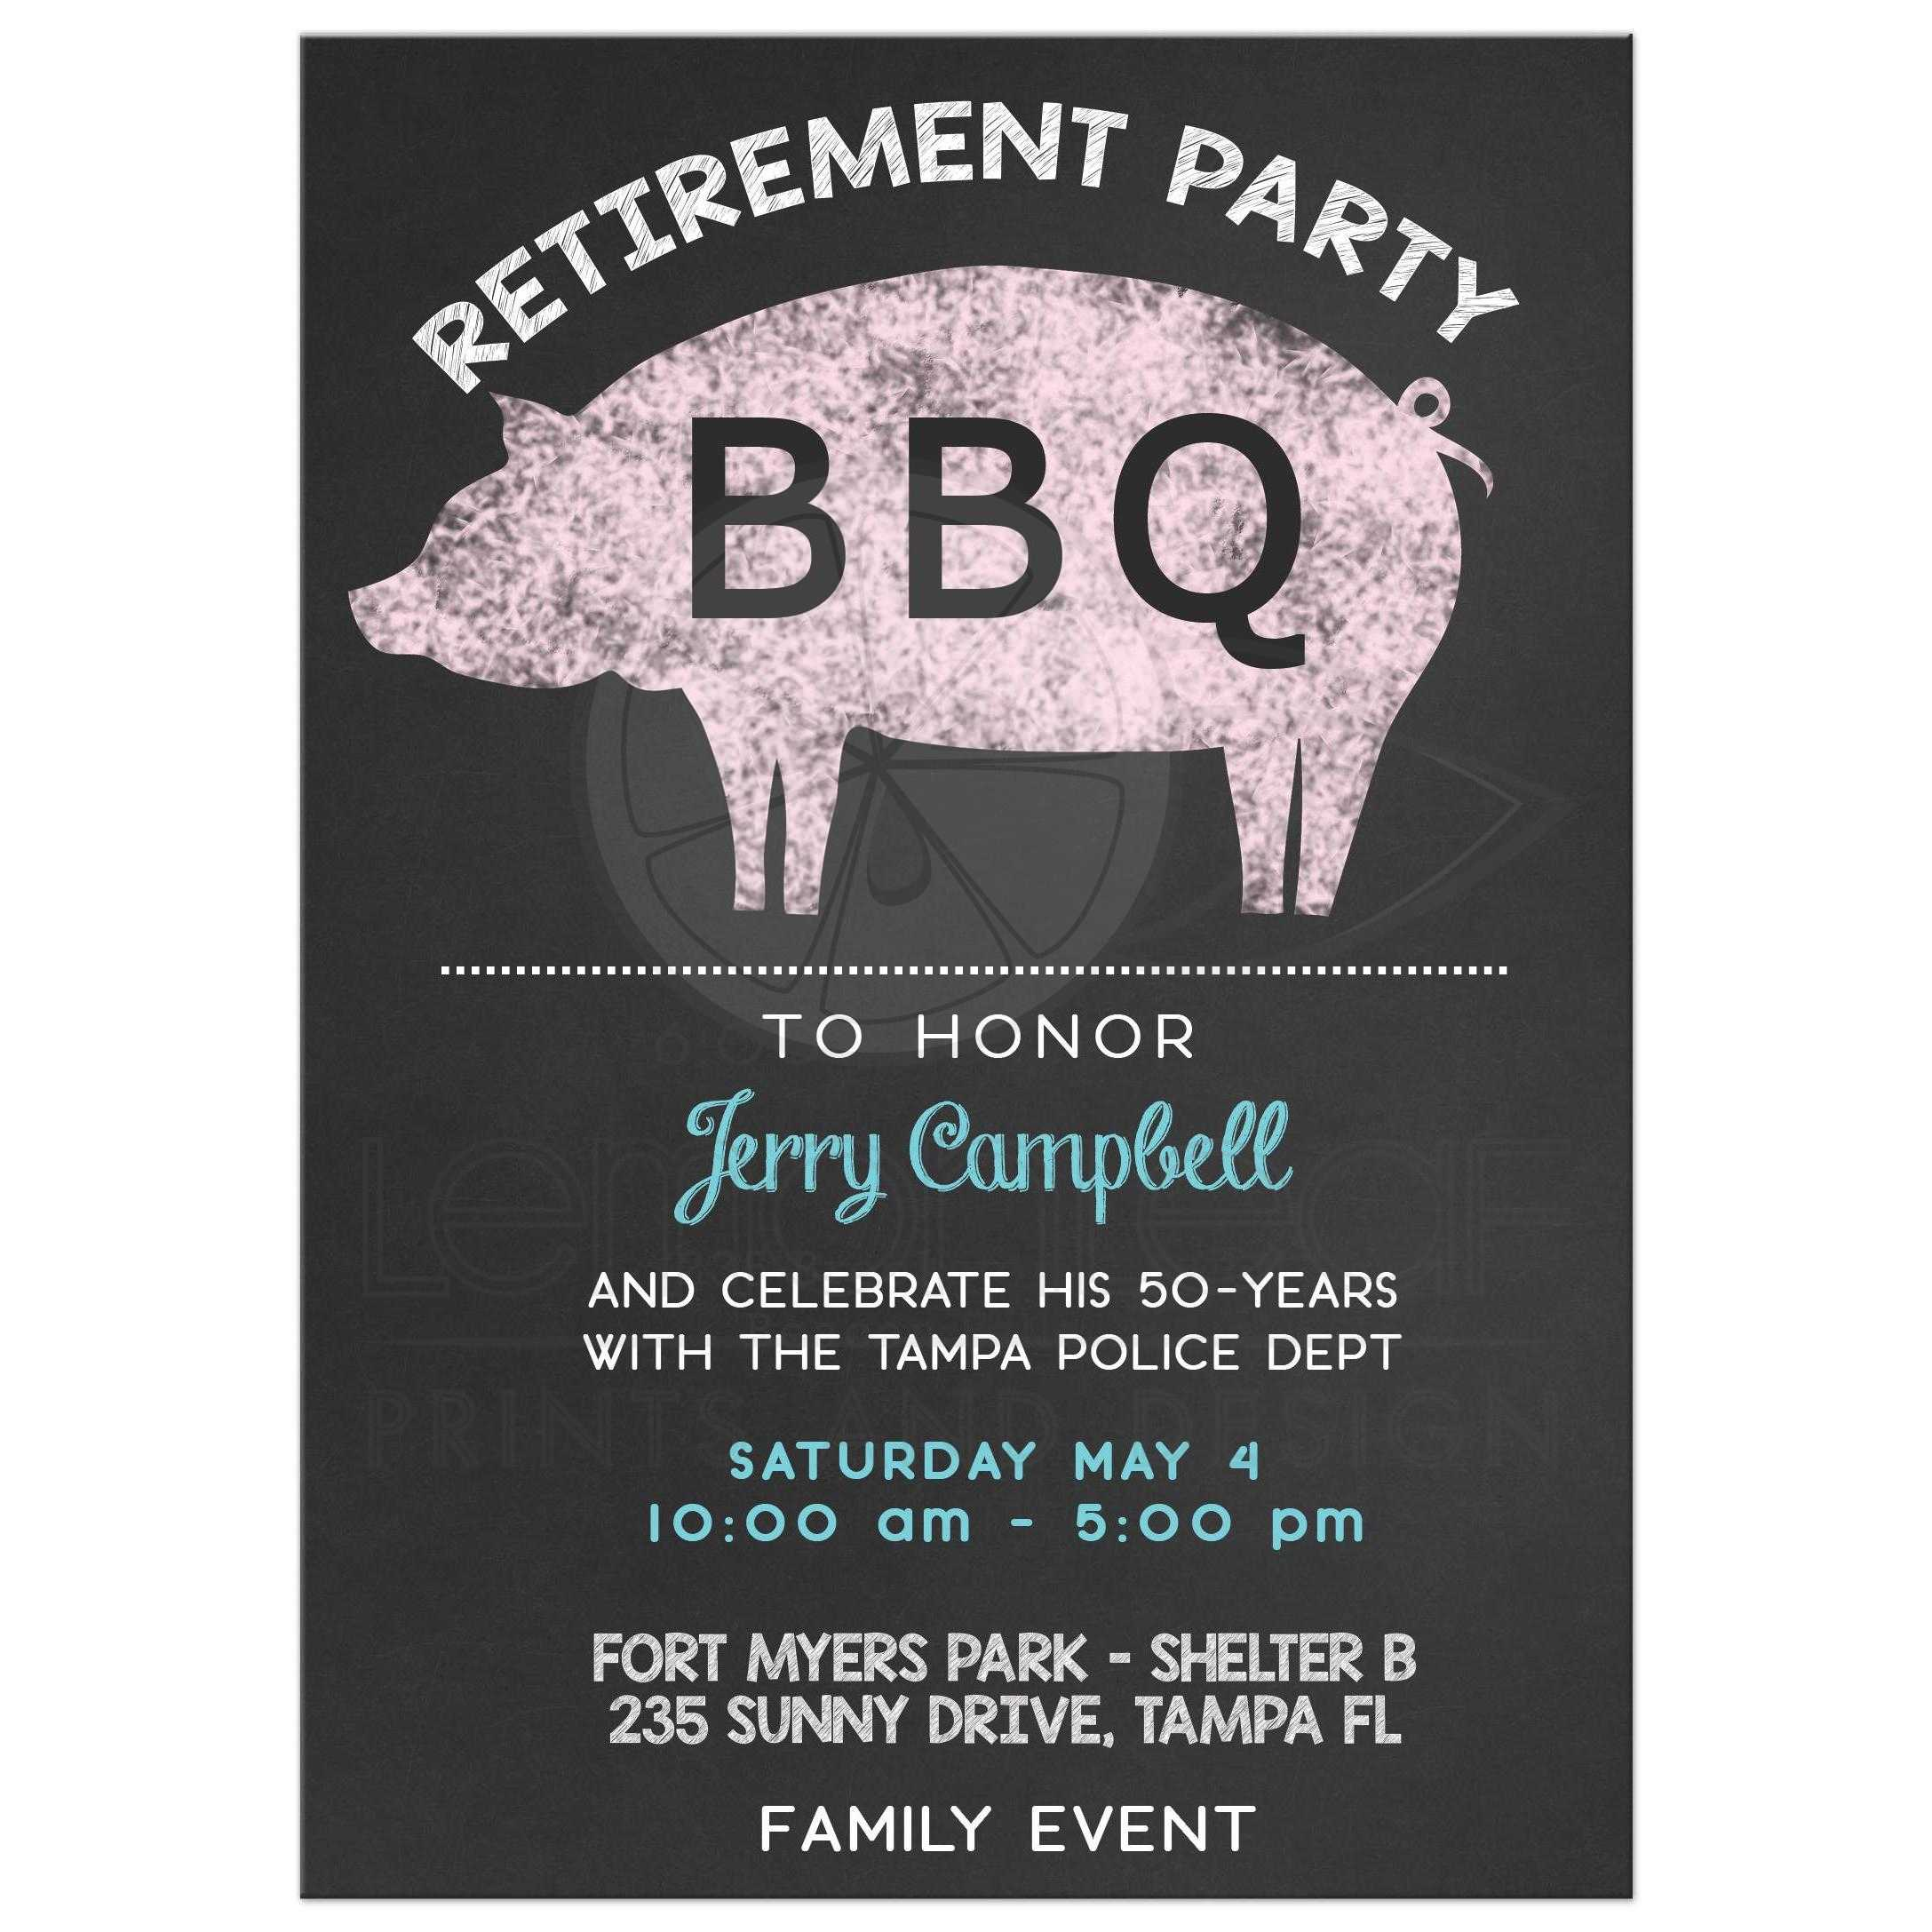 BBQ Pig Roast Chalkboard Retirement Party Invitation